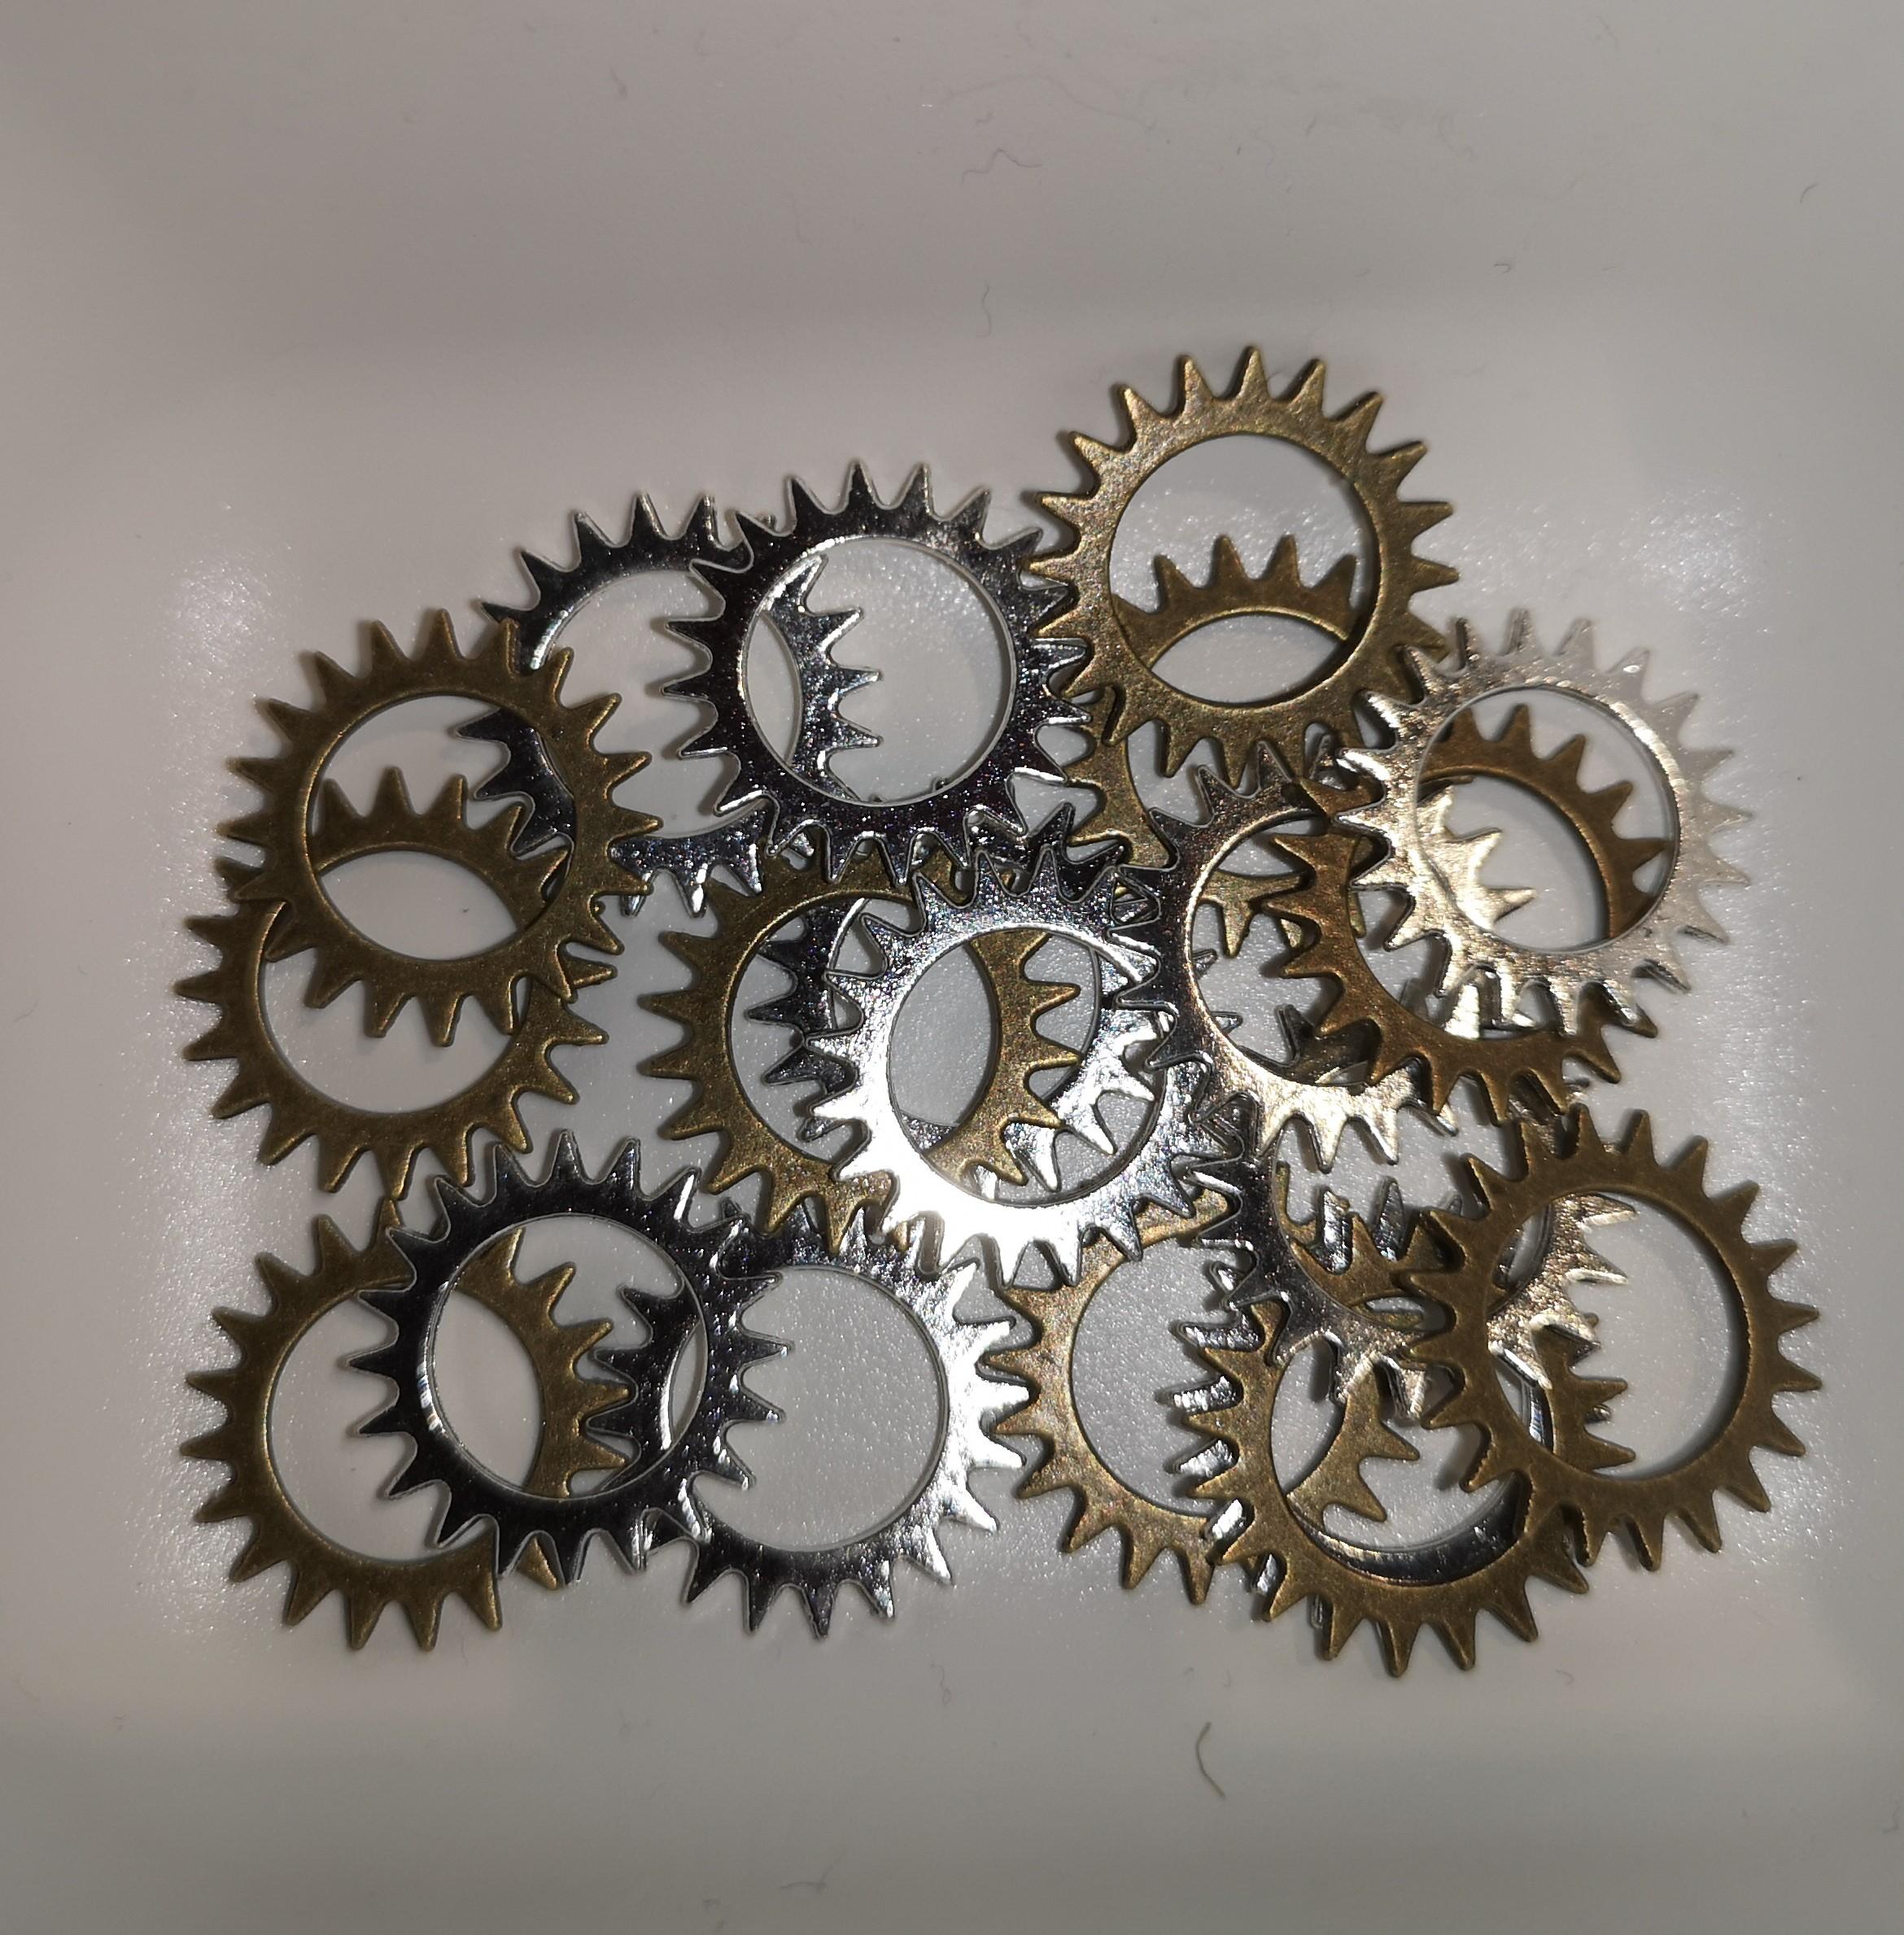 Charms - Gear sirkel 2,1cm blanding - pose 20 stk